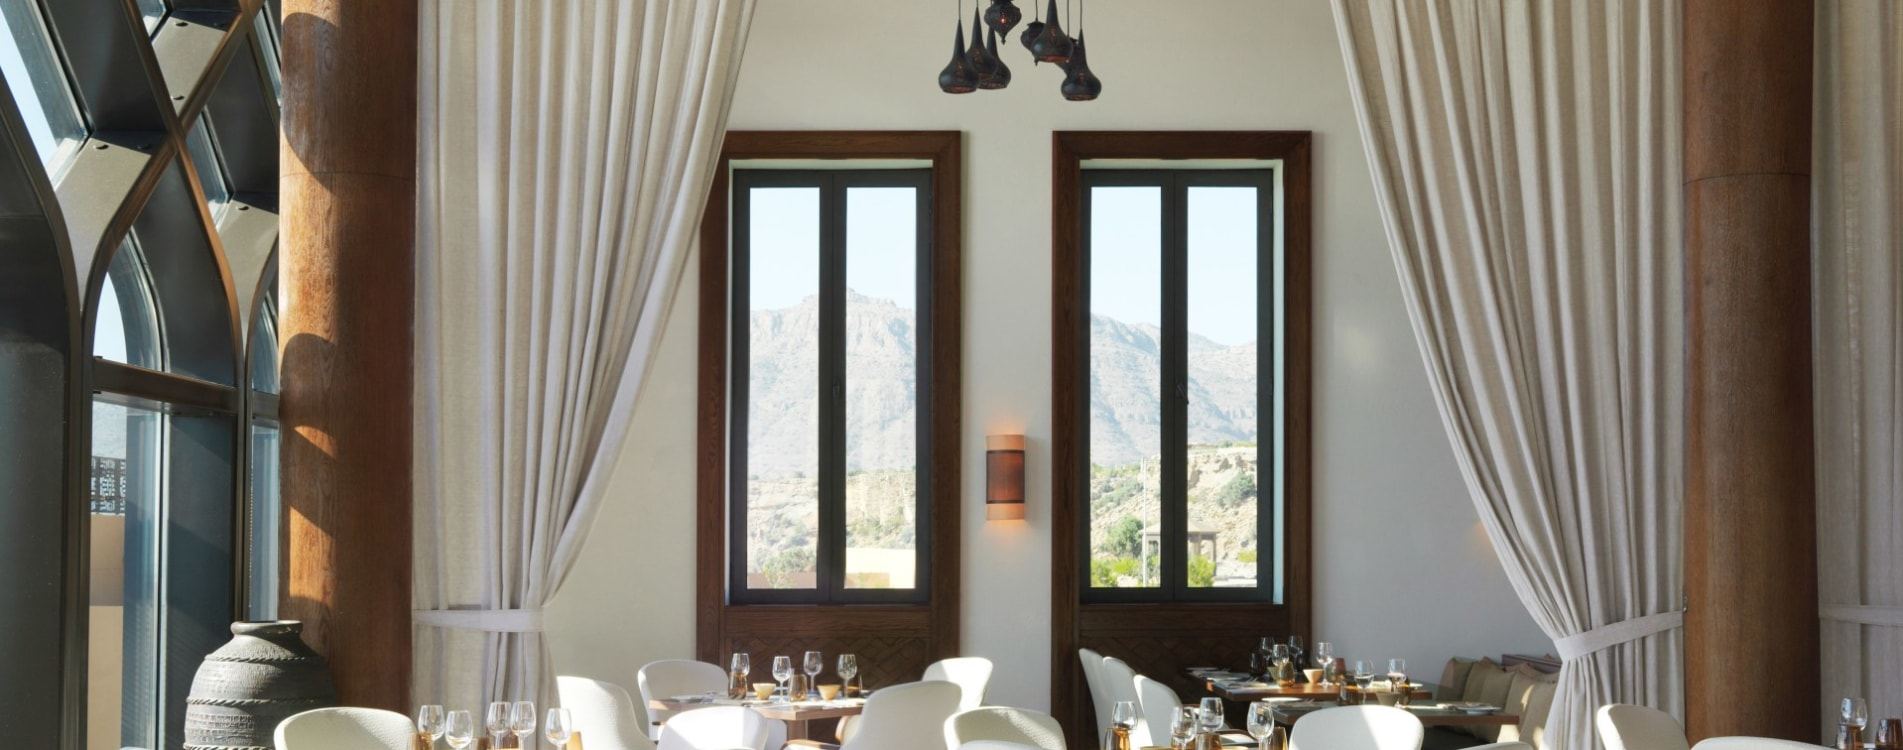 Anantara-Al-Jabal-Al-Akhdar-Resort-Dining-Al-Maisan-Restaurant-Oman.jpg